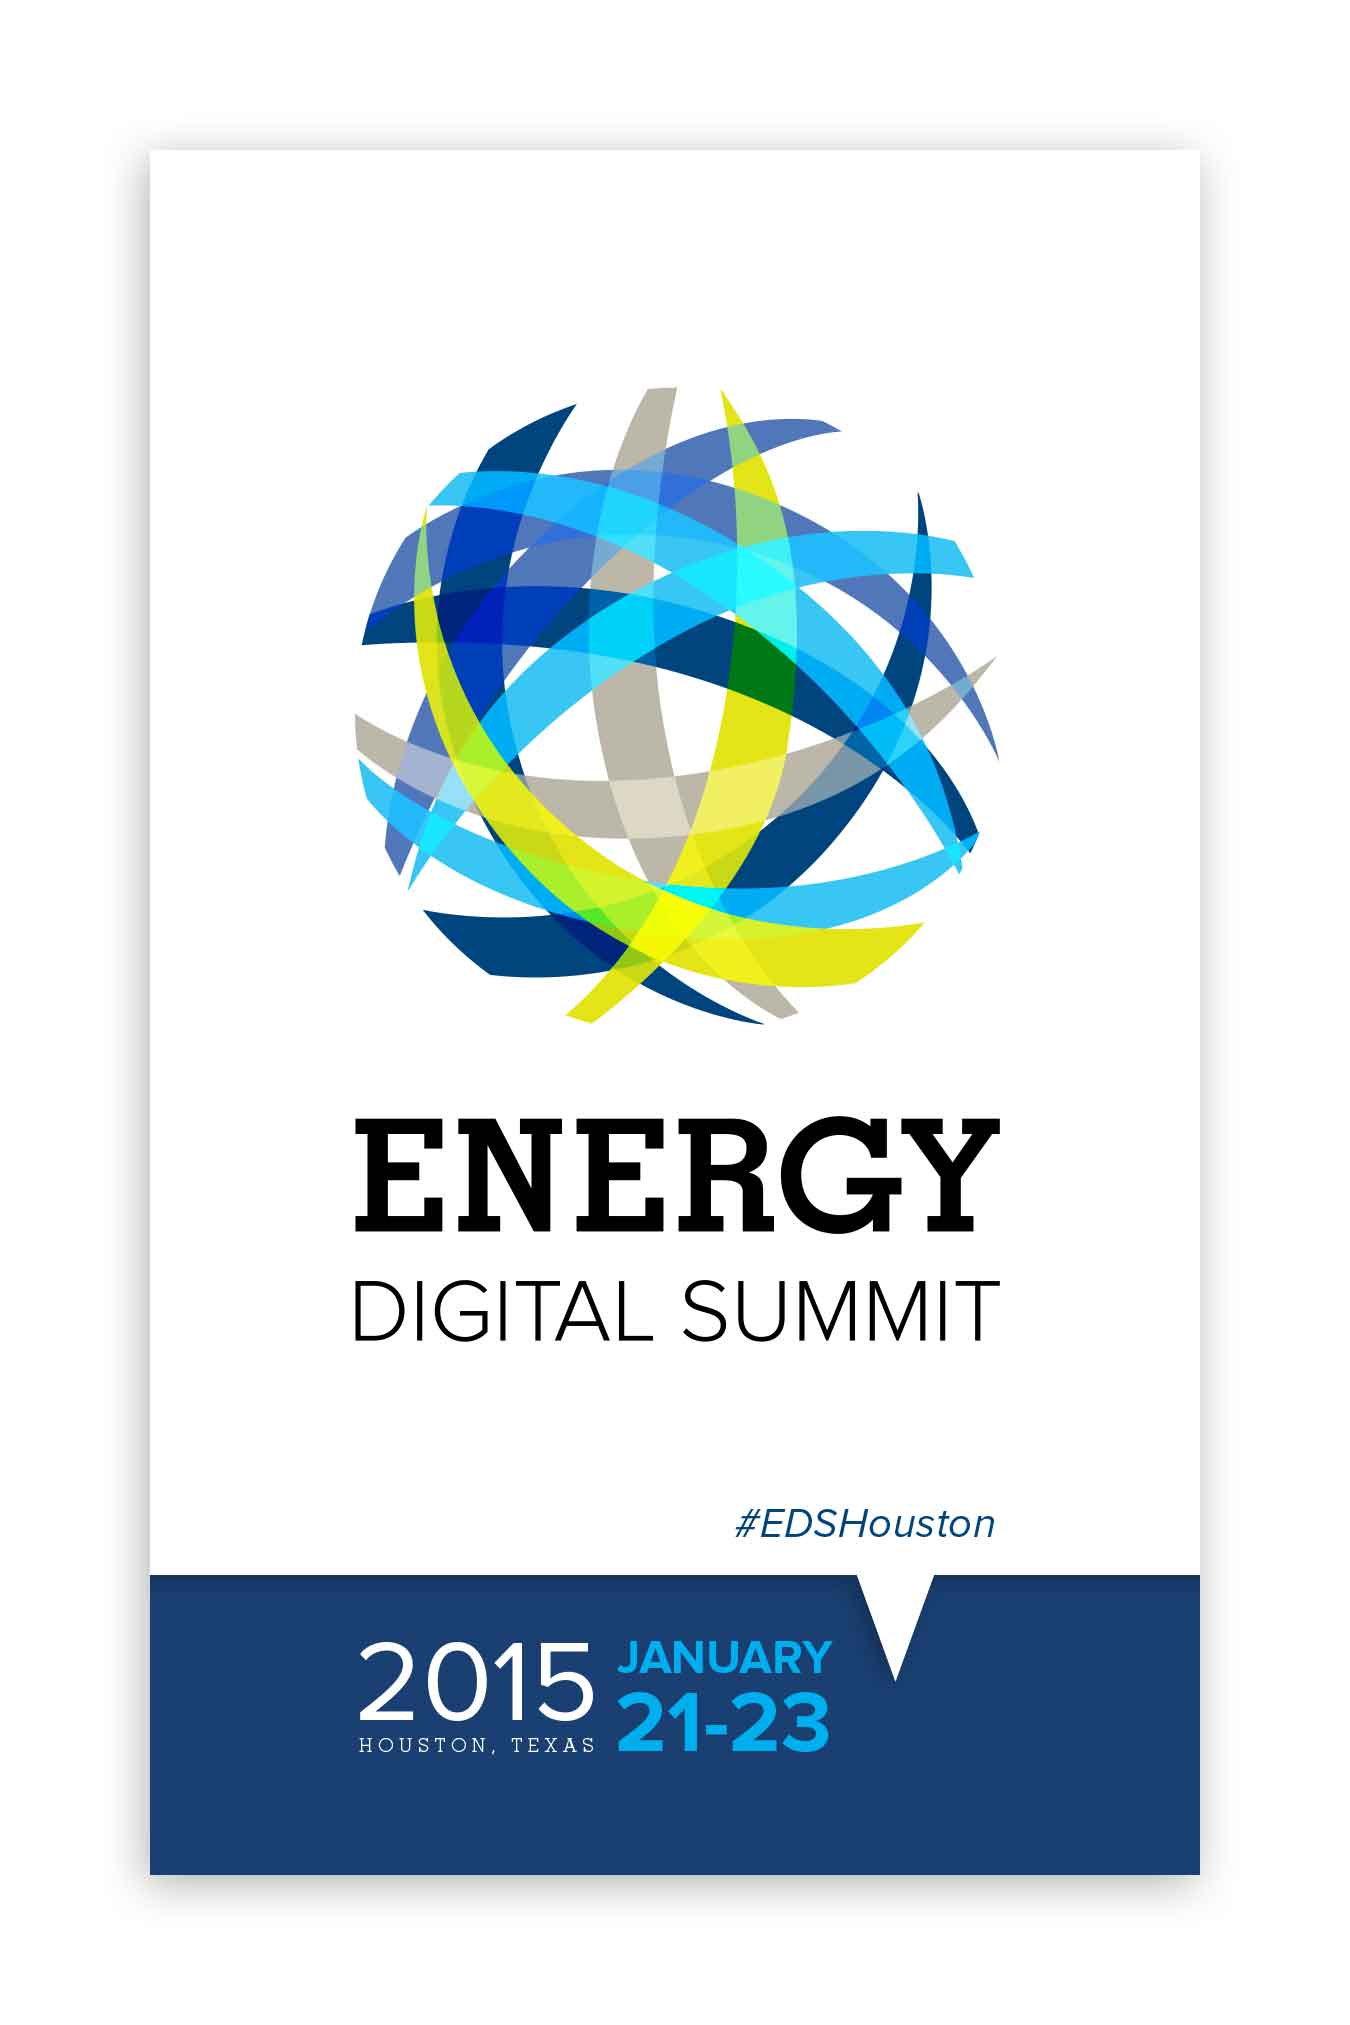 Energy Digital Summit program insert guide